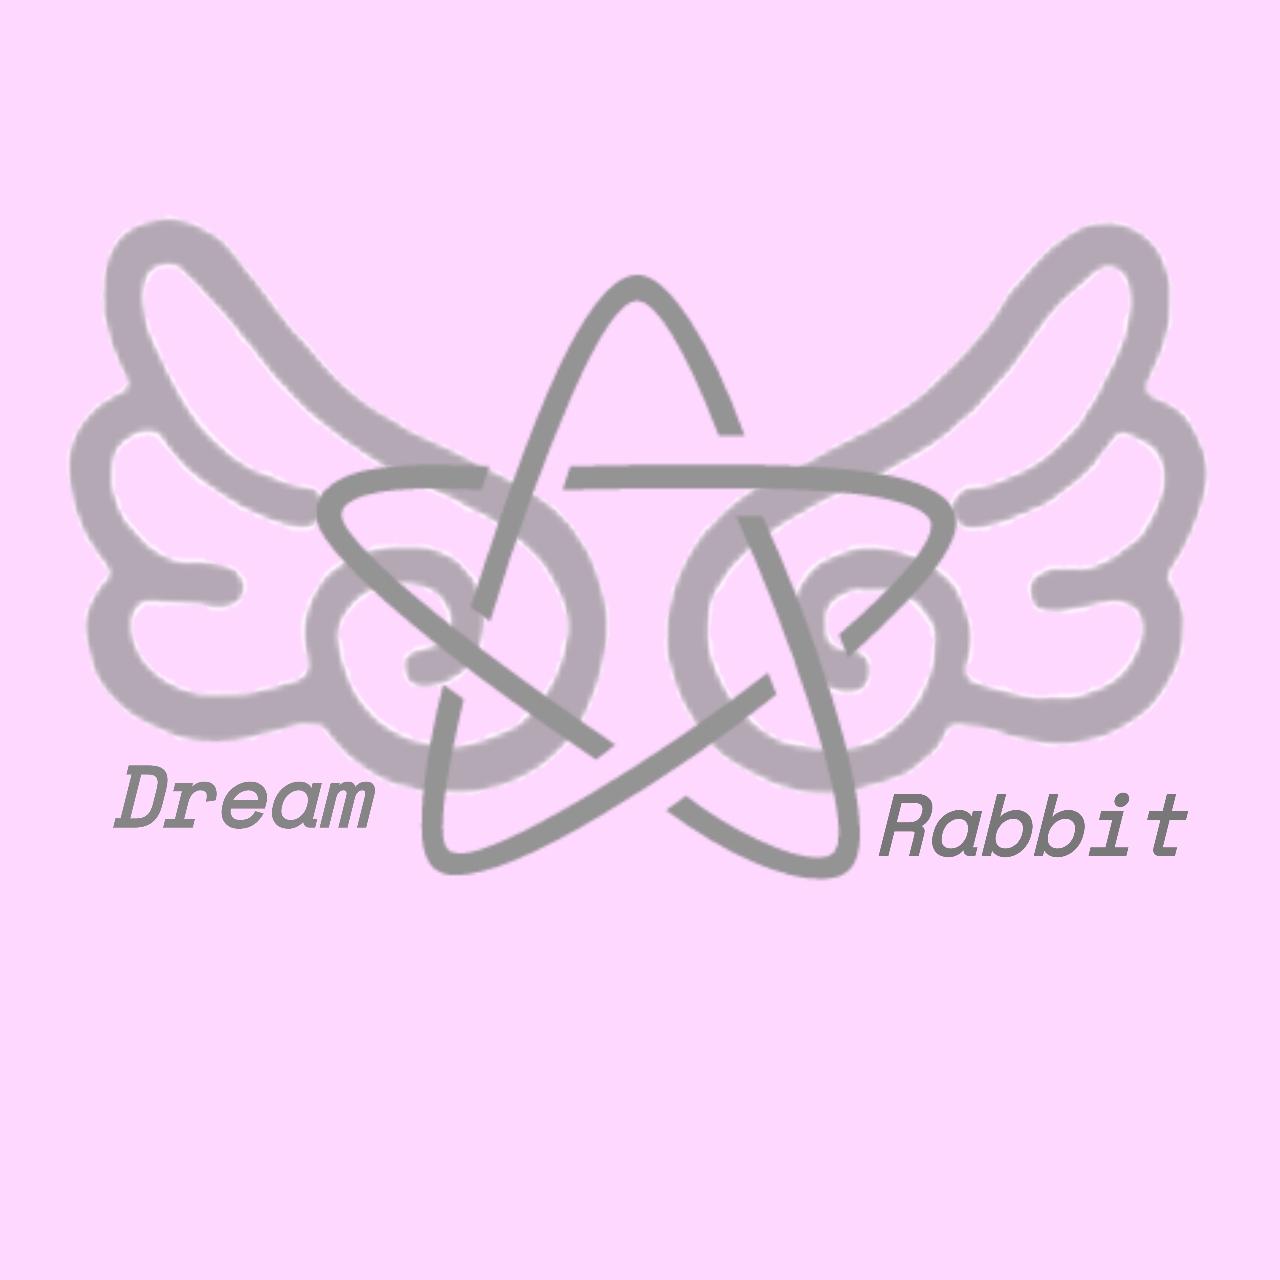 DreamRabbit